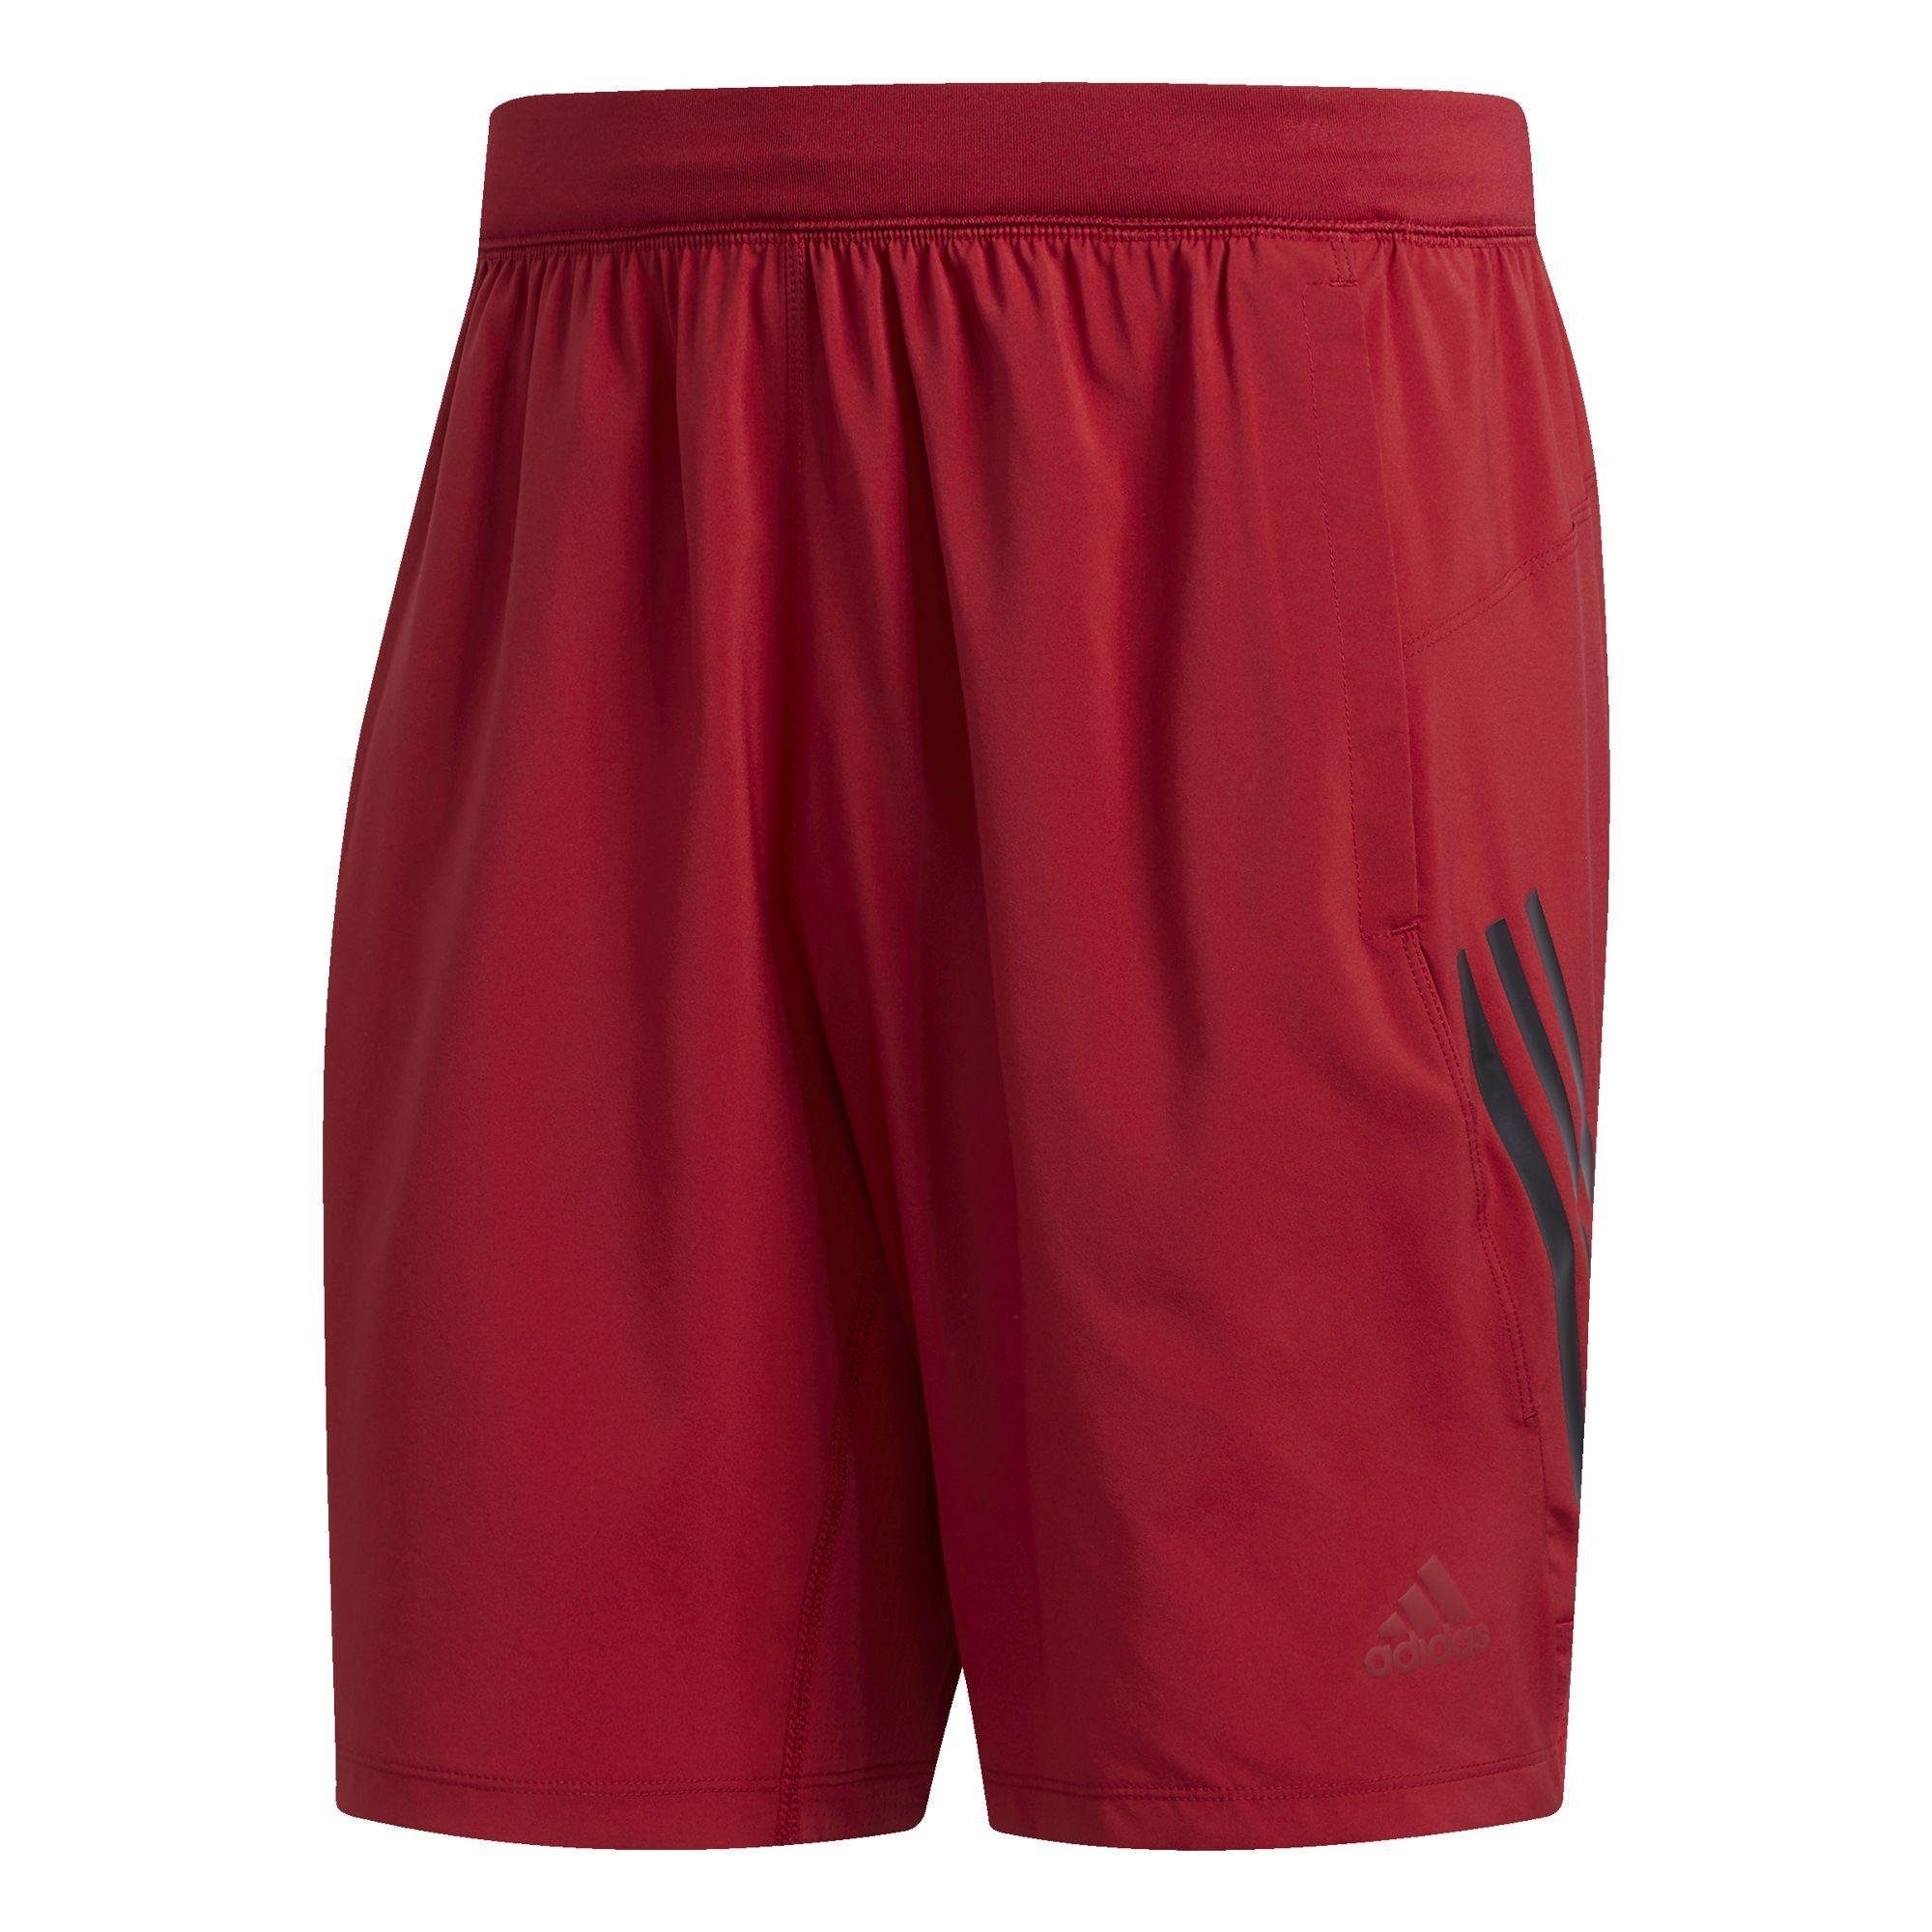 adidas Performance Shorts »4KRFT Tech Woven 3 Streifen Shorts« Clima online kaufen | OTTO